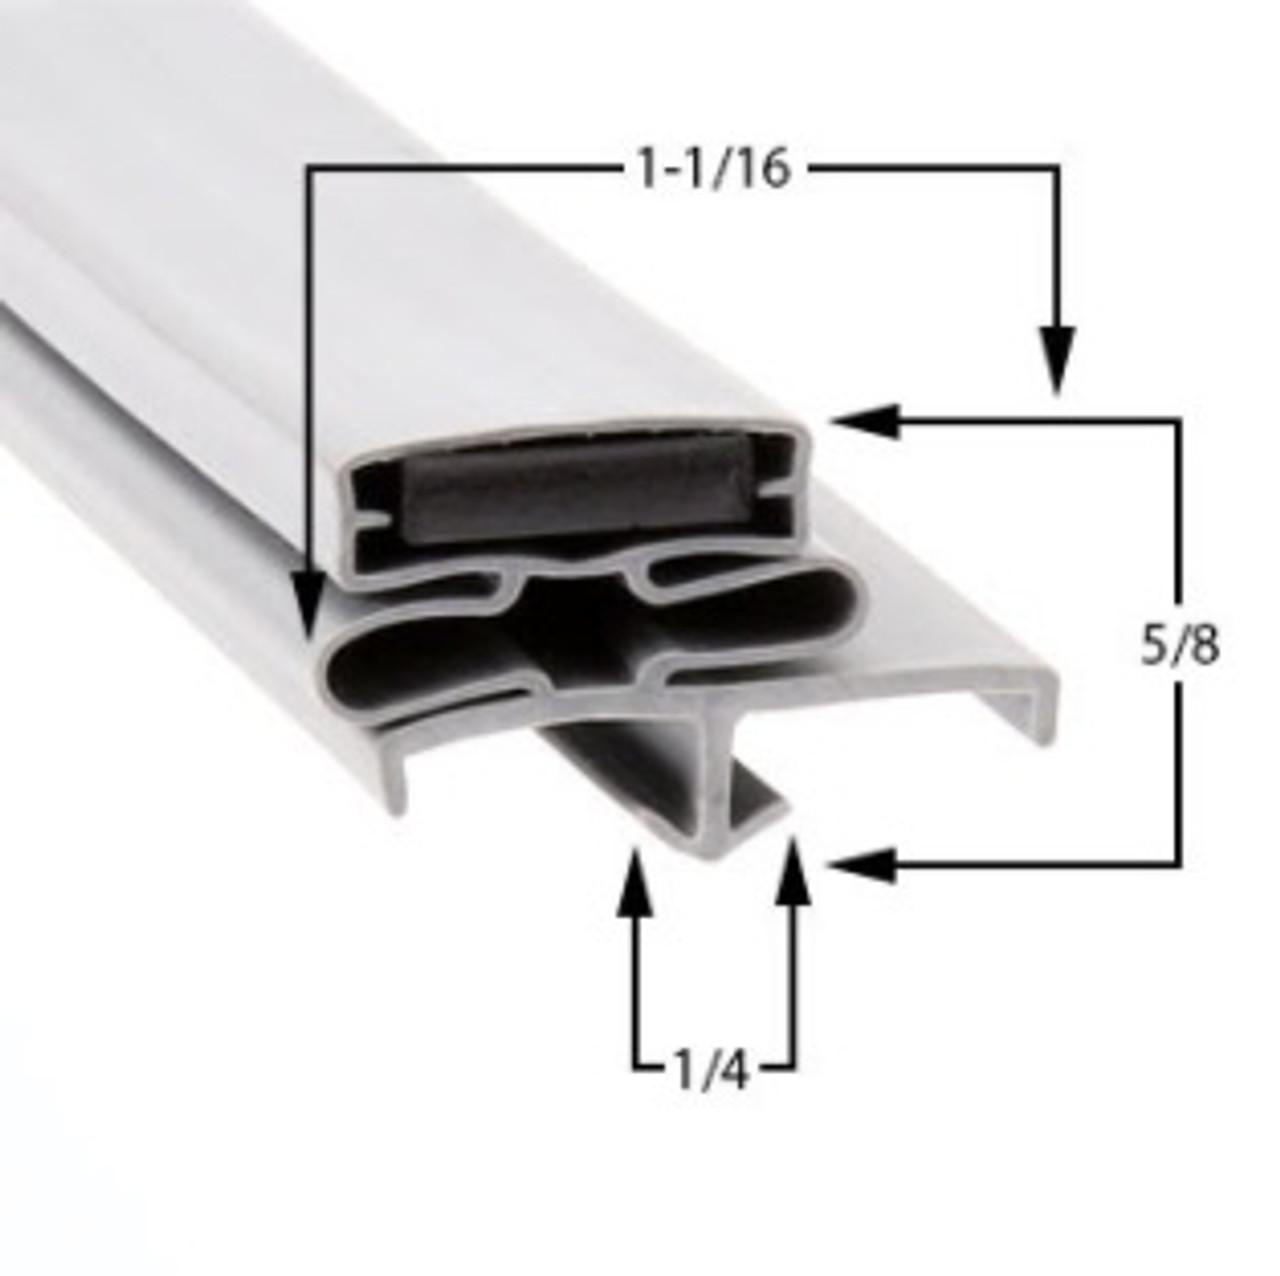 Delfield Door Gasket Profile 168 12 x 30 -A2.0833, 170-1125-C-2